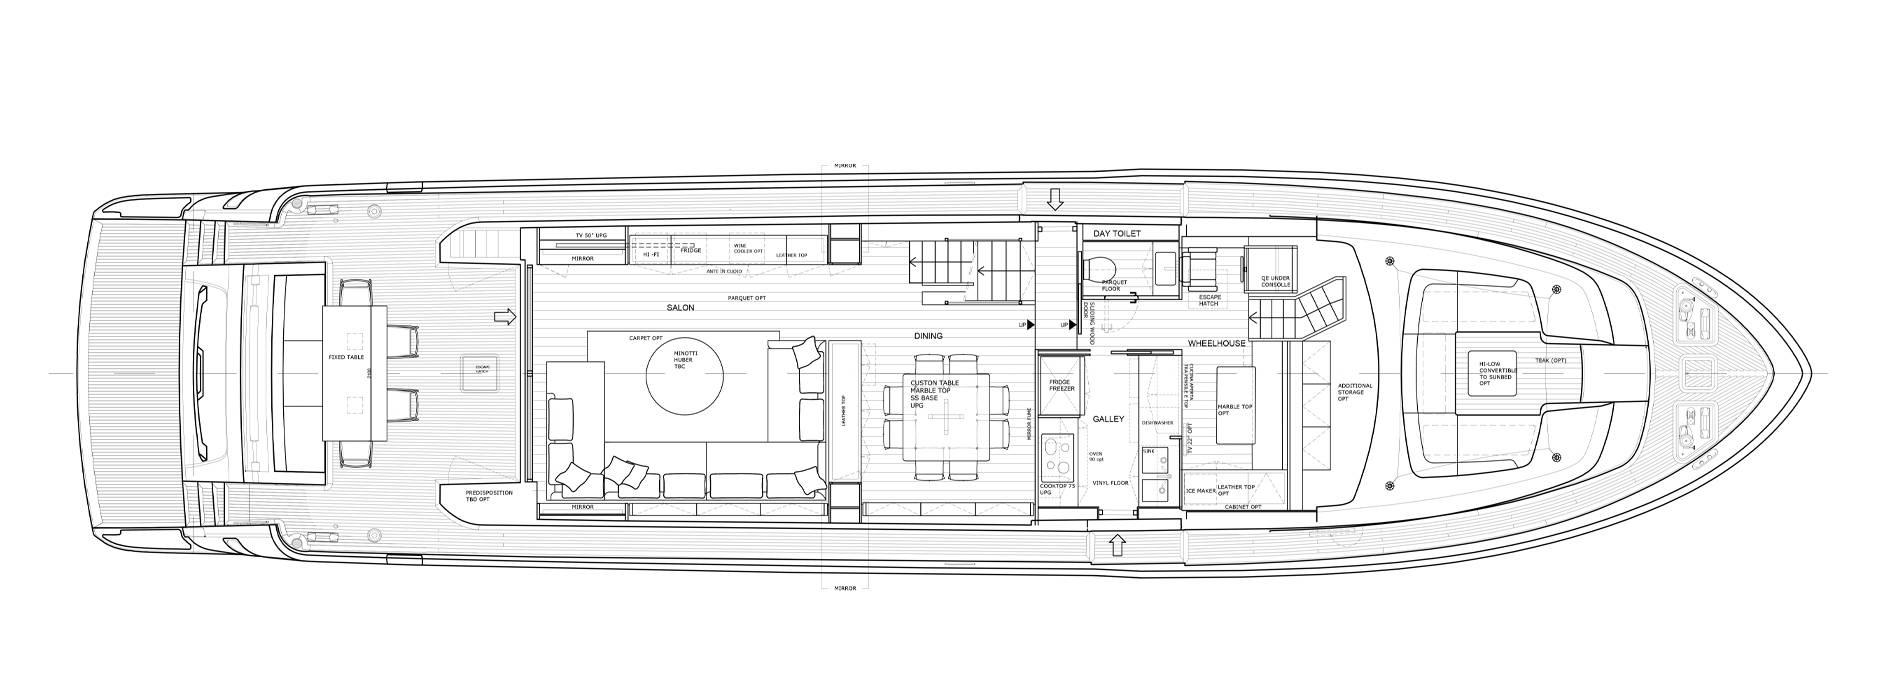 Sanlorenzo Yachts SL86-727 Главная палуба